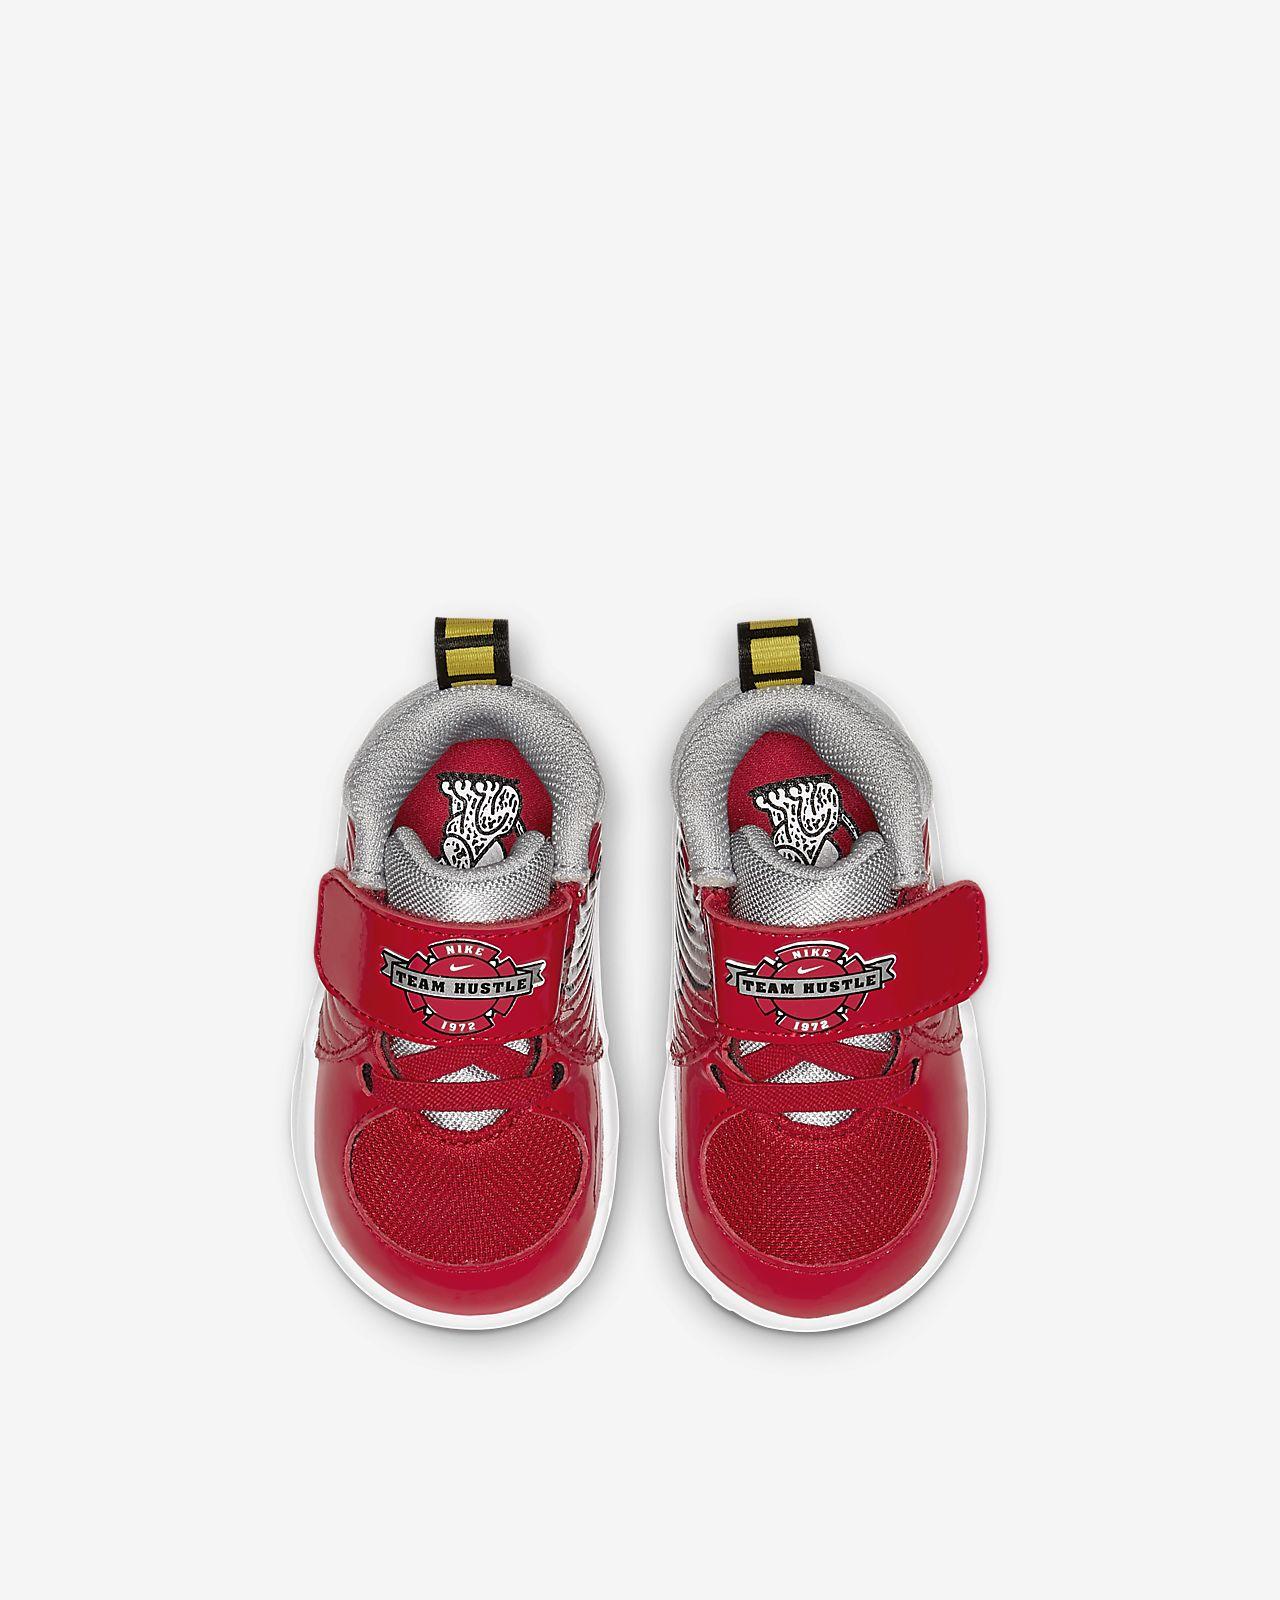 Sapatilhas Nike Team Hustle D 9 Auto para bebé